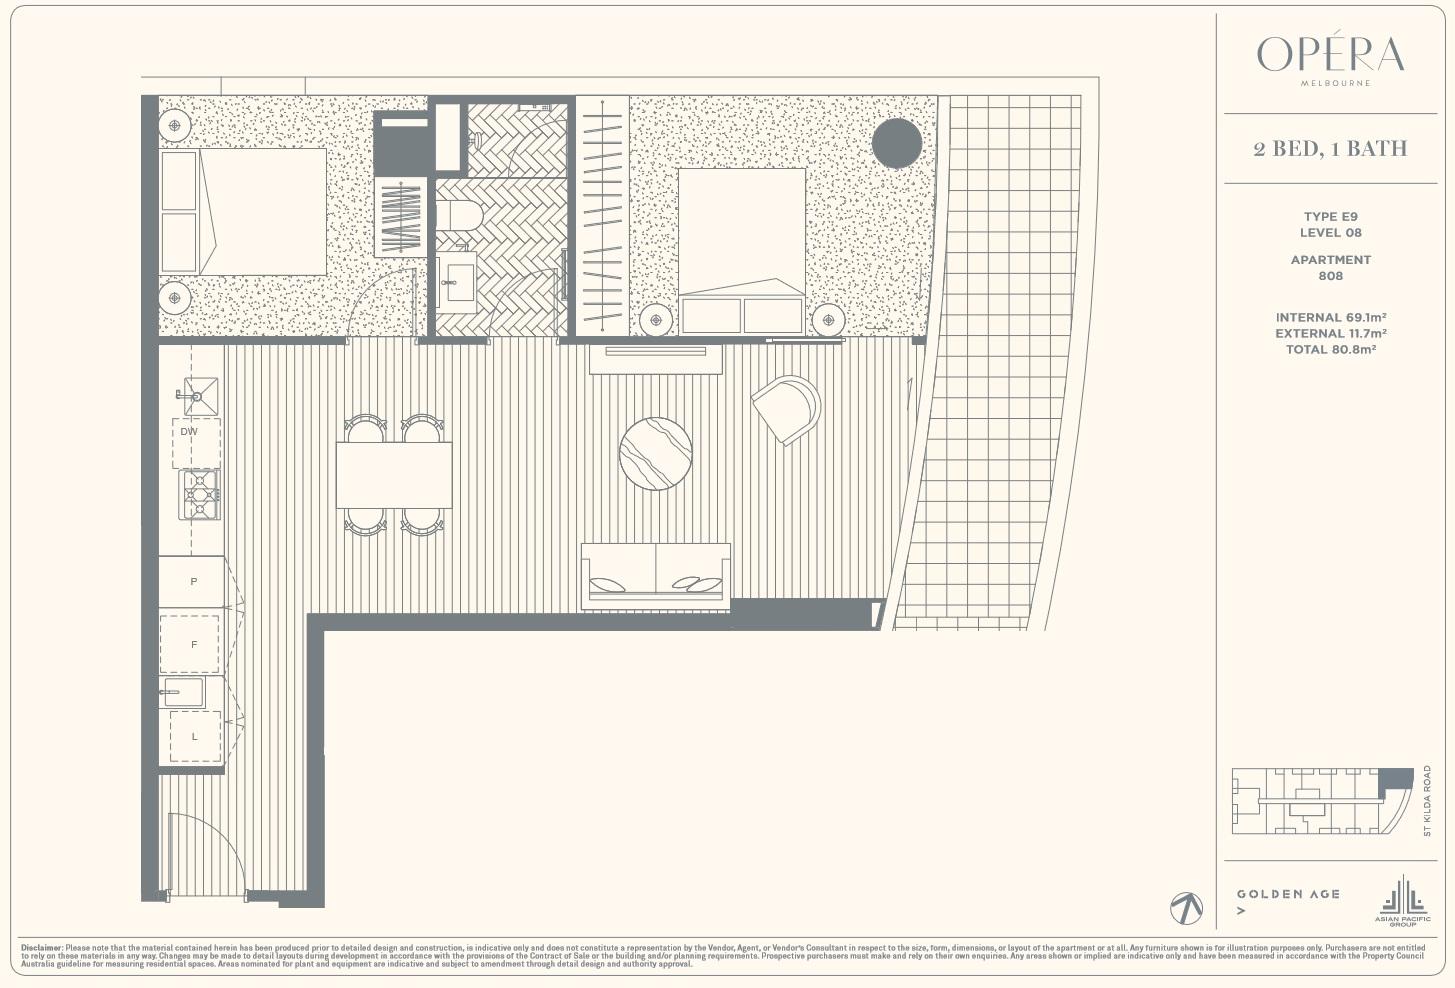 Floor Plan Type E9 - 2Bed1Bath